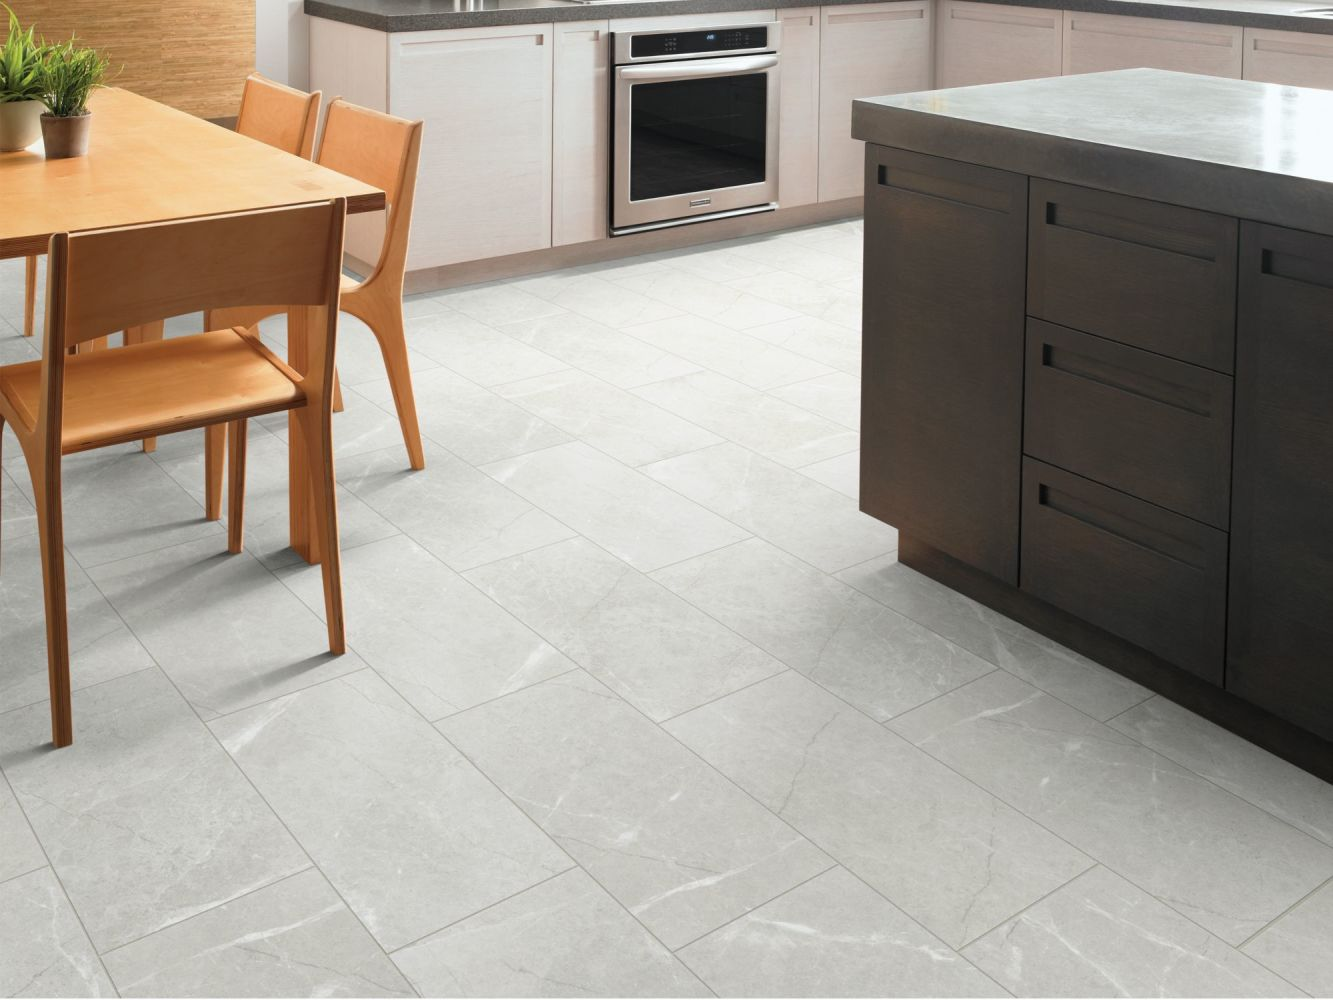 Shaw Floors Home Fn Gold Ceramic Illusion 13×13 Haven 00250_TG94C